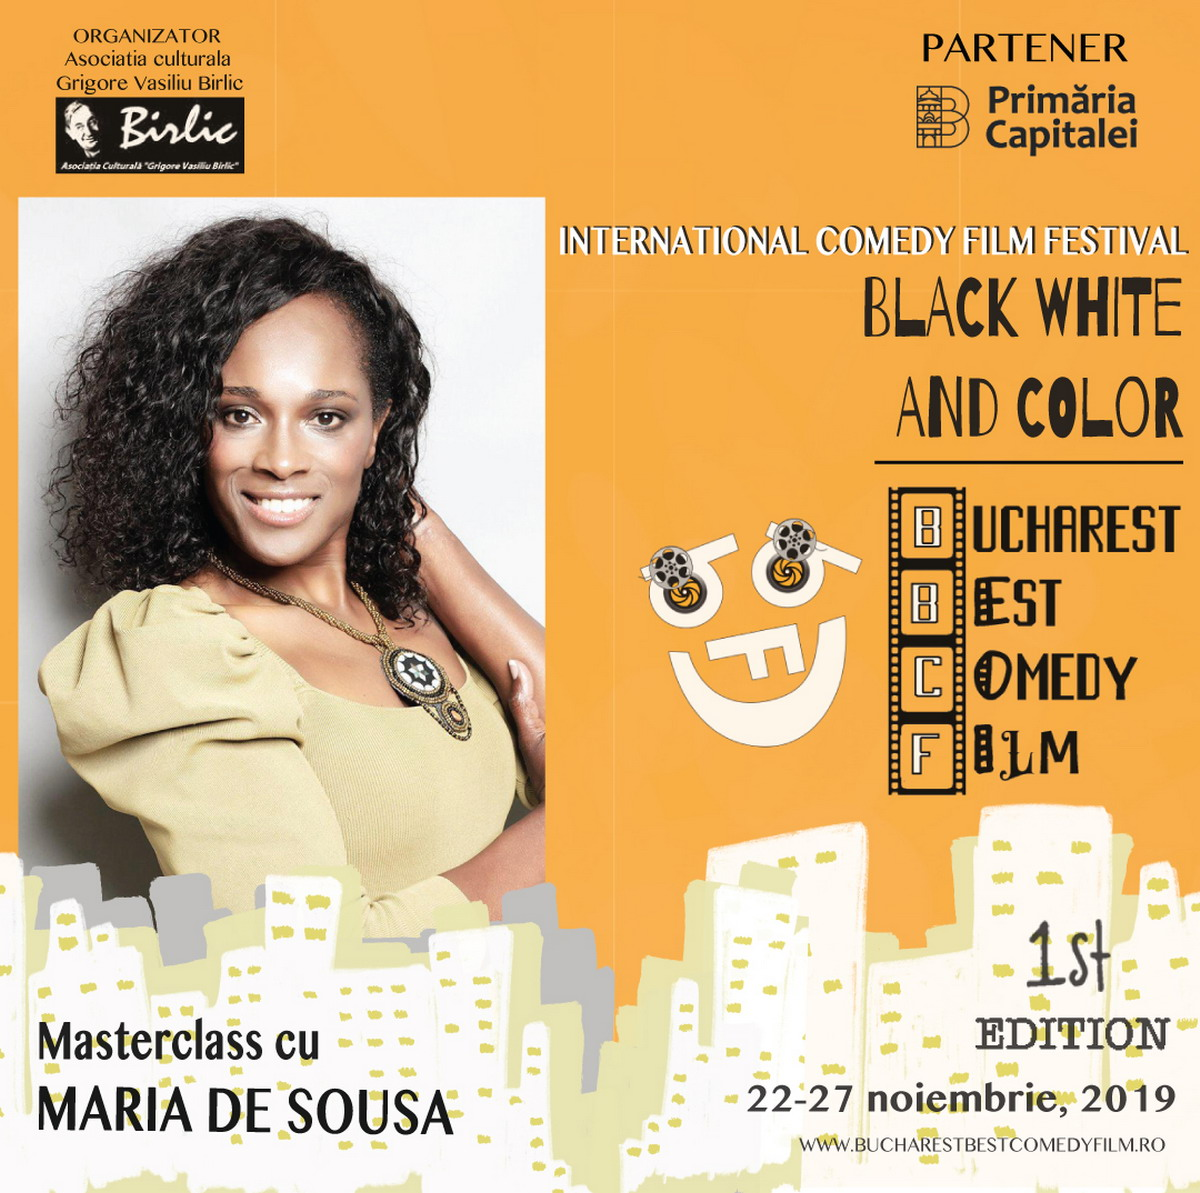 Masterclass cu Maria de Sousa și Kristina Cepraga